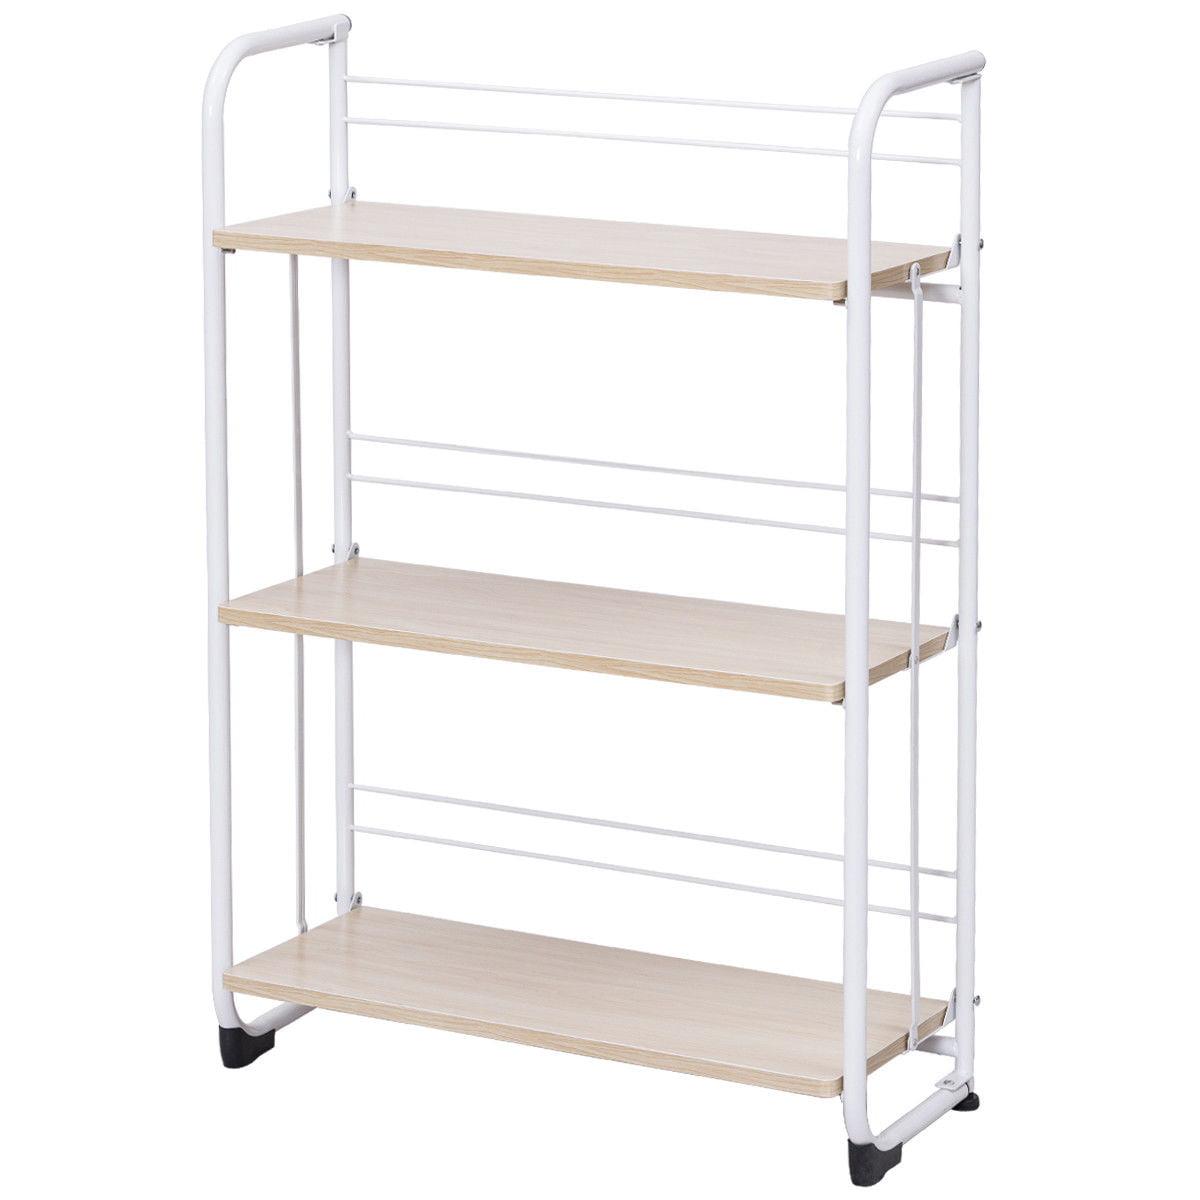 Gymax Folding 3 Tier Shelves Organization Storage Utility Shelving Unit Standing Rack - image 10 of 10